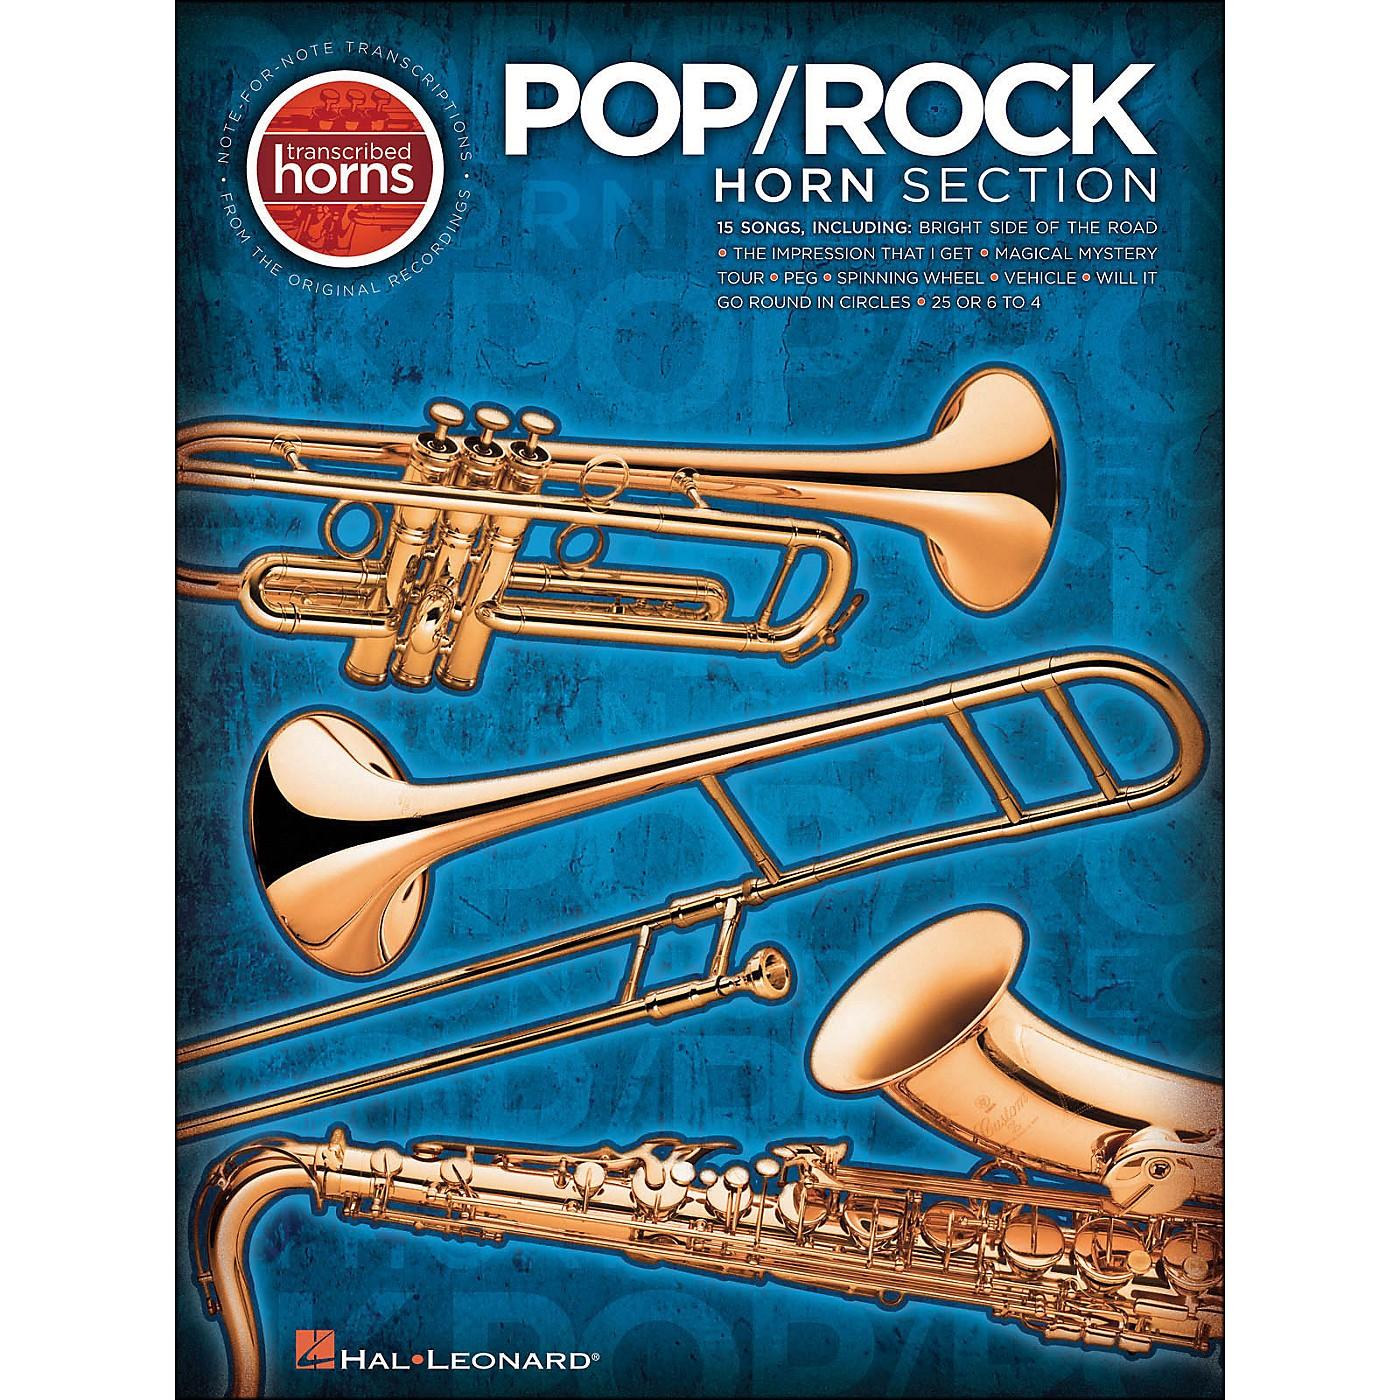 Hal Leonard Pop / Rock Horn Section Transcribed Horns thumbnail